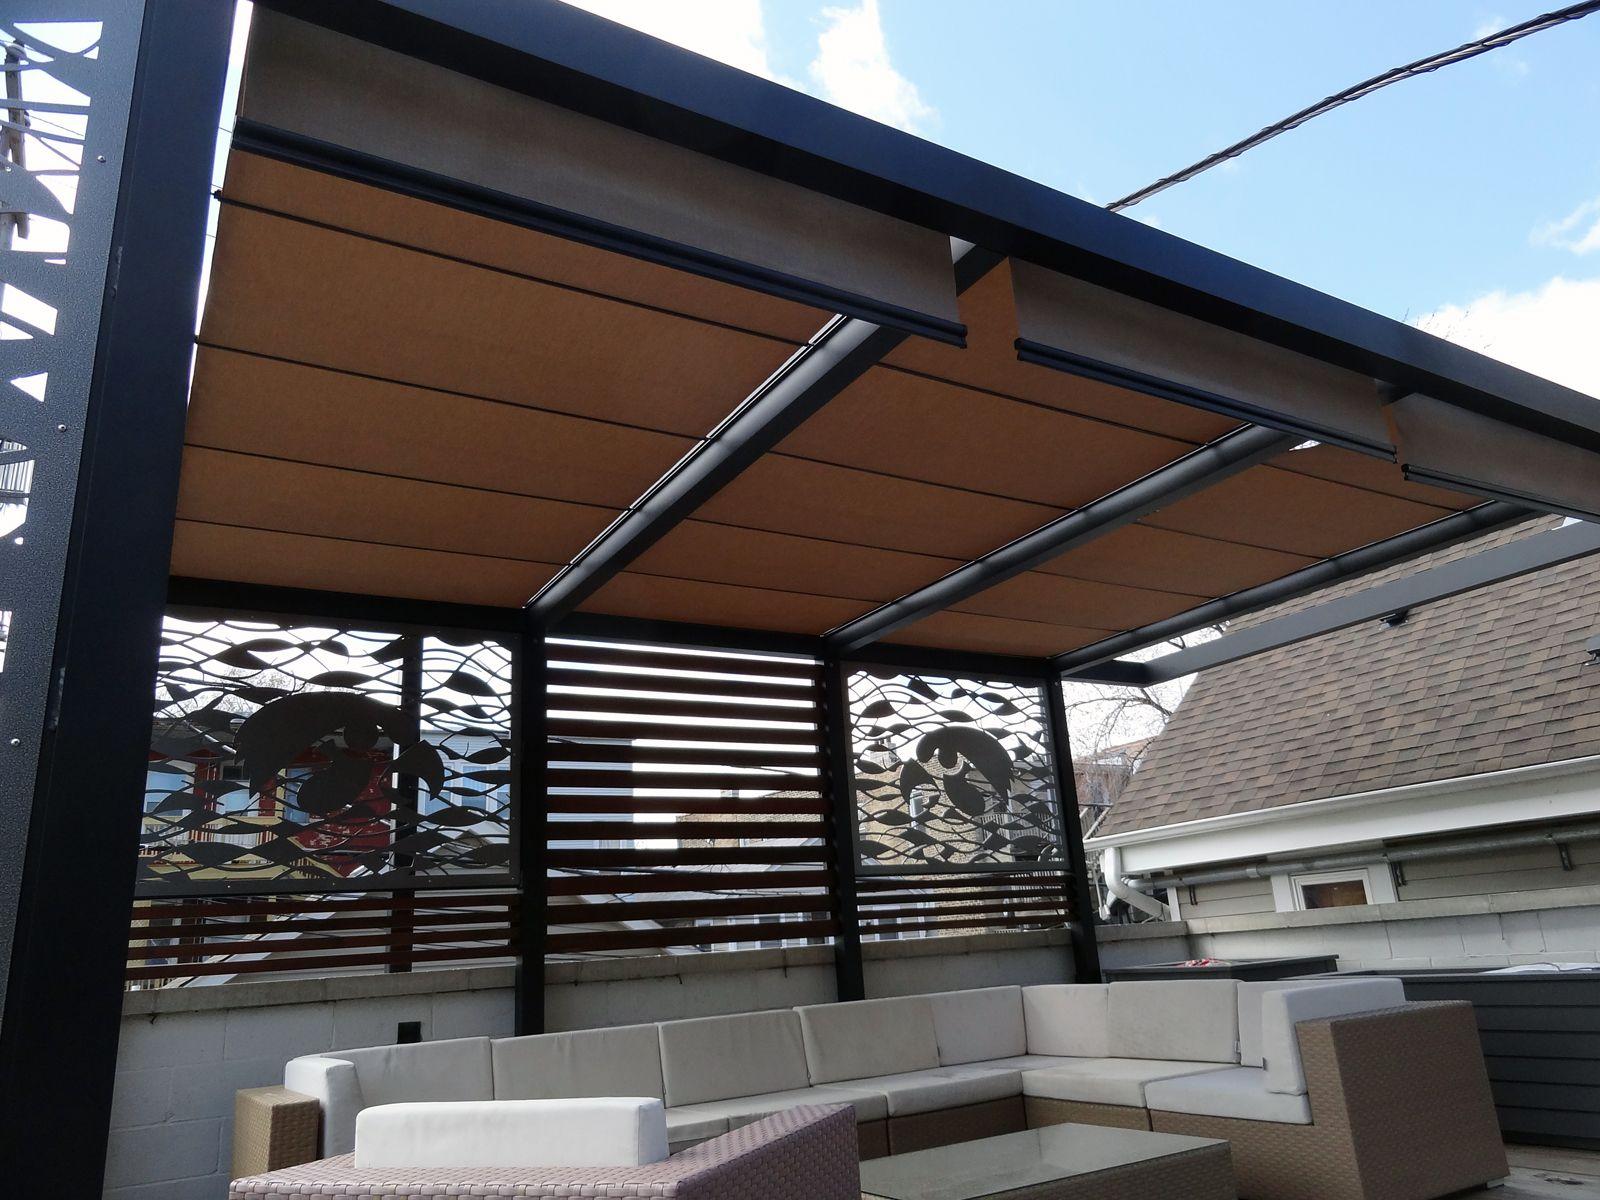 Roof Deck, Pergola, Retractable Shades, Privacy Screens, Outdoor Furniture,  Urban, Garden, Landscape, Design